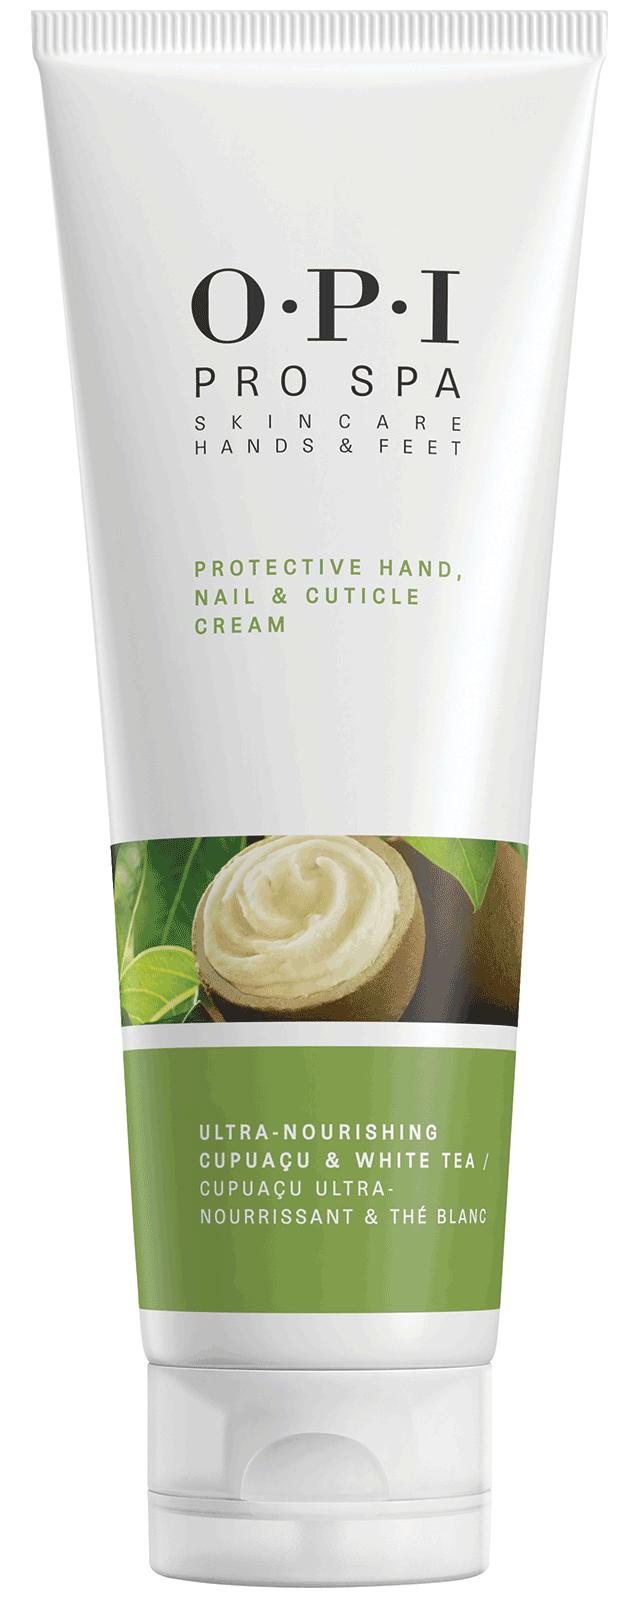 OPI Крем защитный для рук, ногтей и кутикулы / PRO SPA 236мл opi лосьон для рук и тела opi avoplex moisture replenishing lotion av711 30 мл